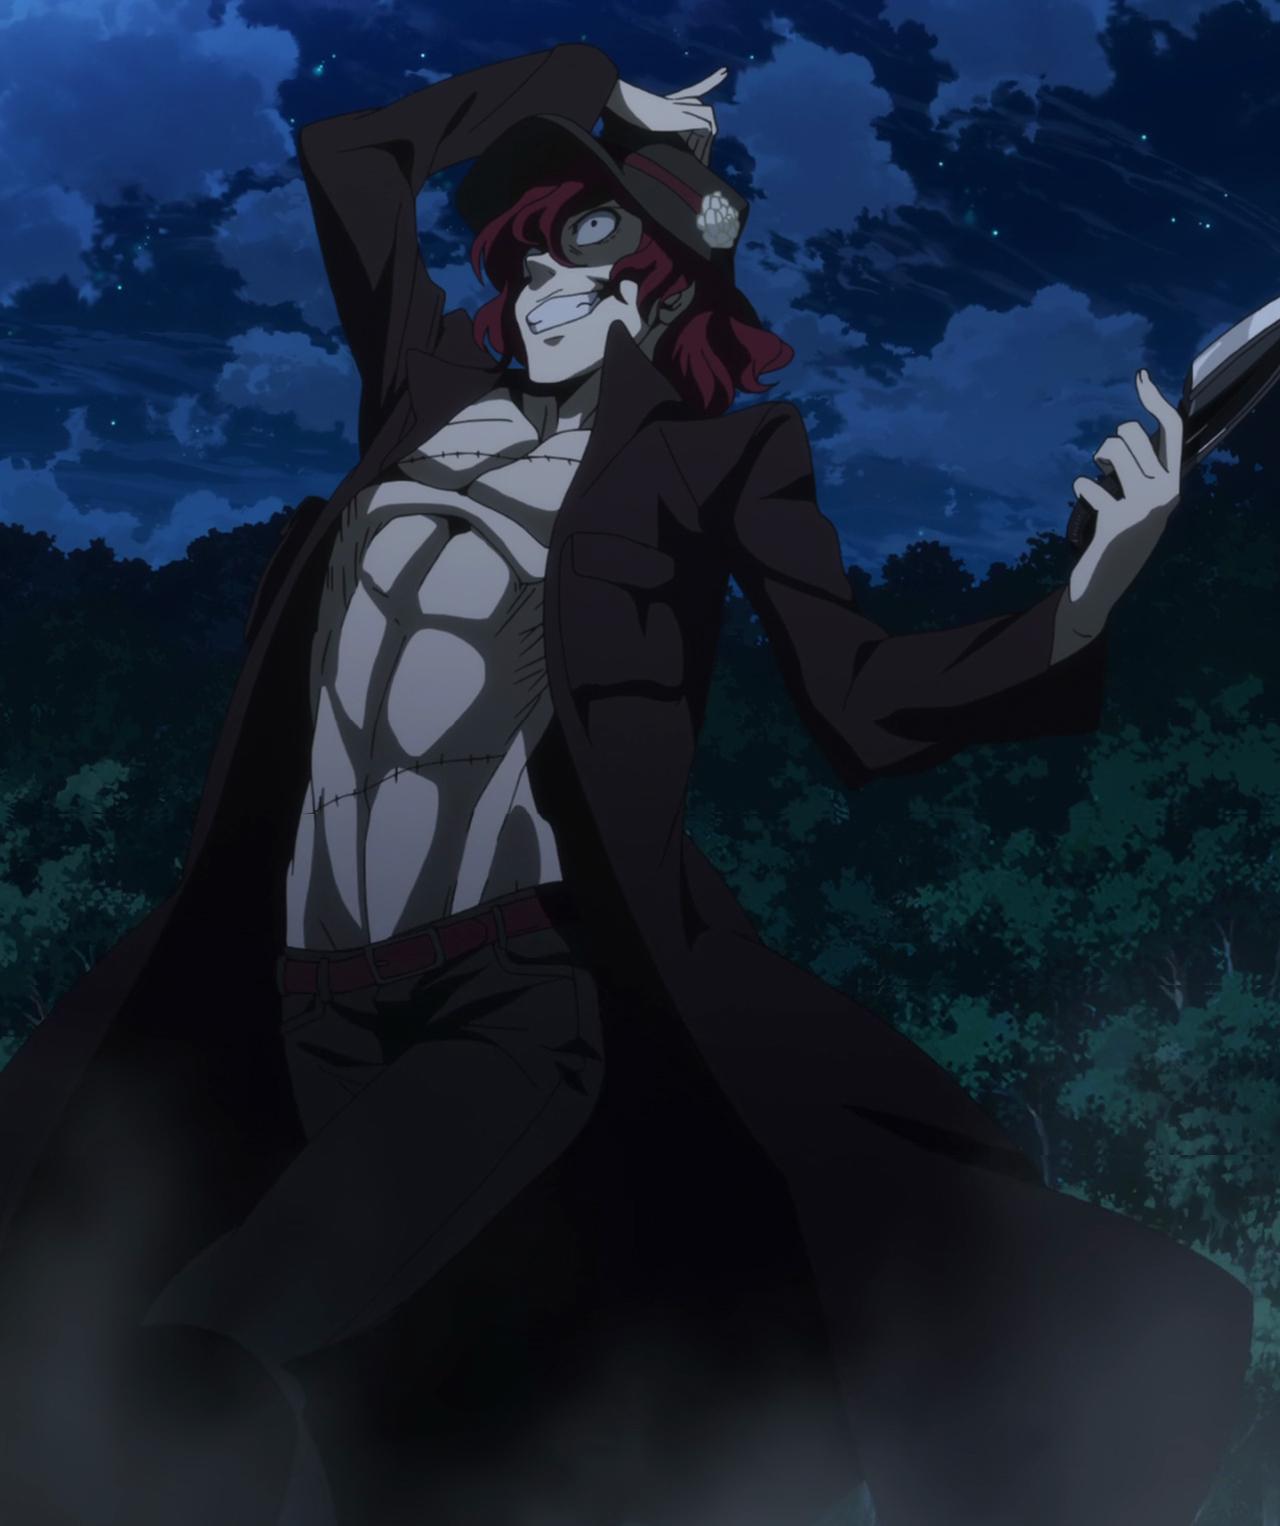 Manga Denizi Akame Ga Kill